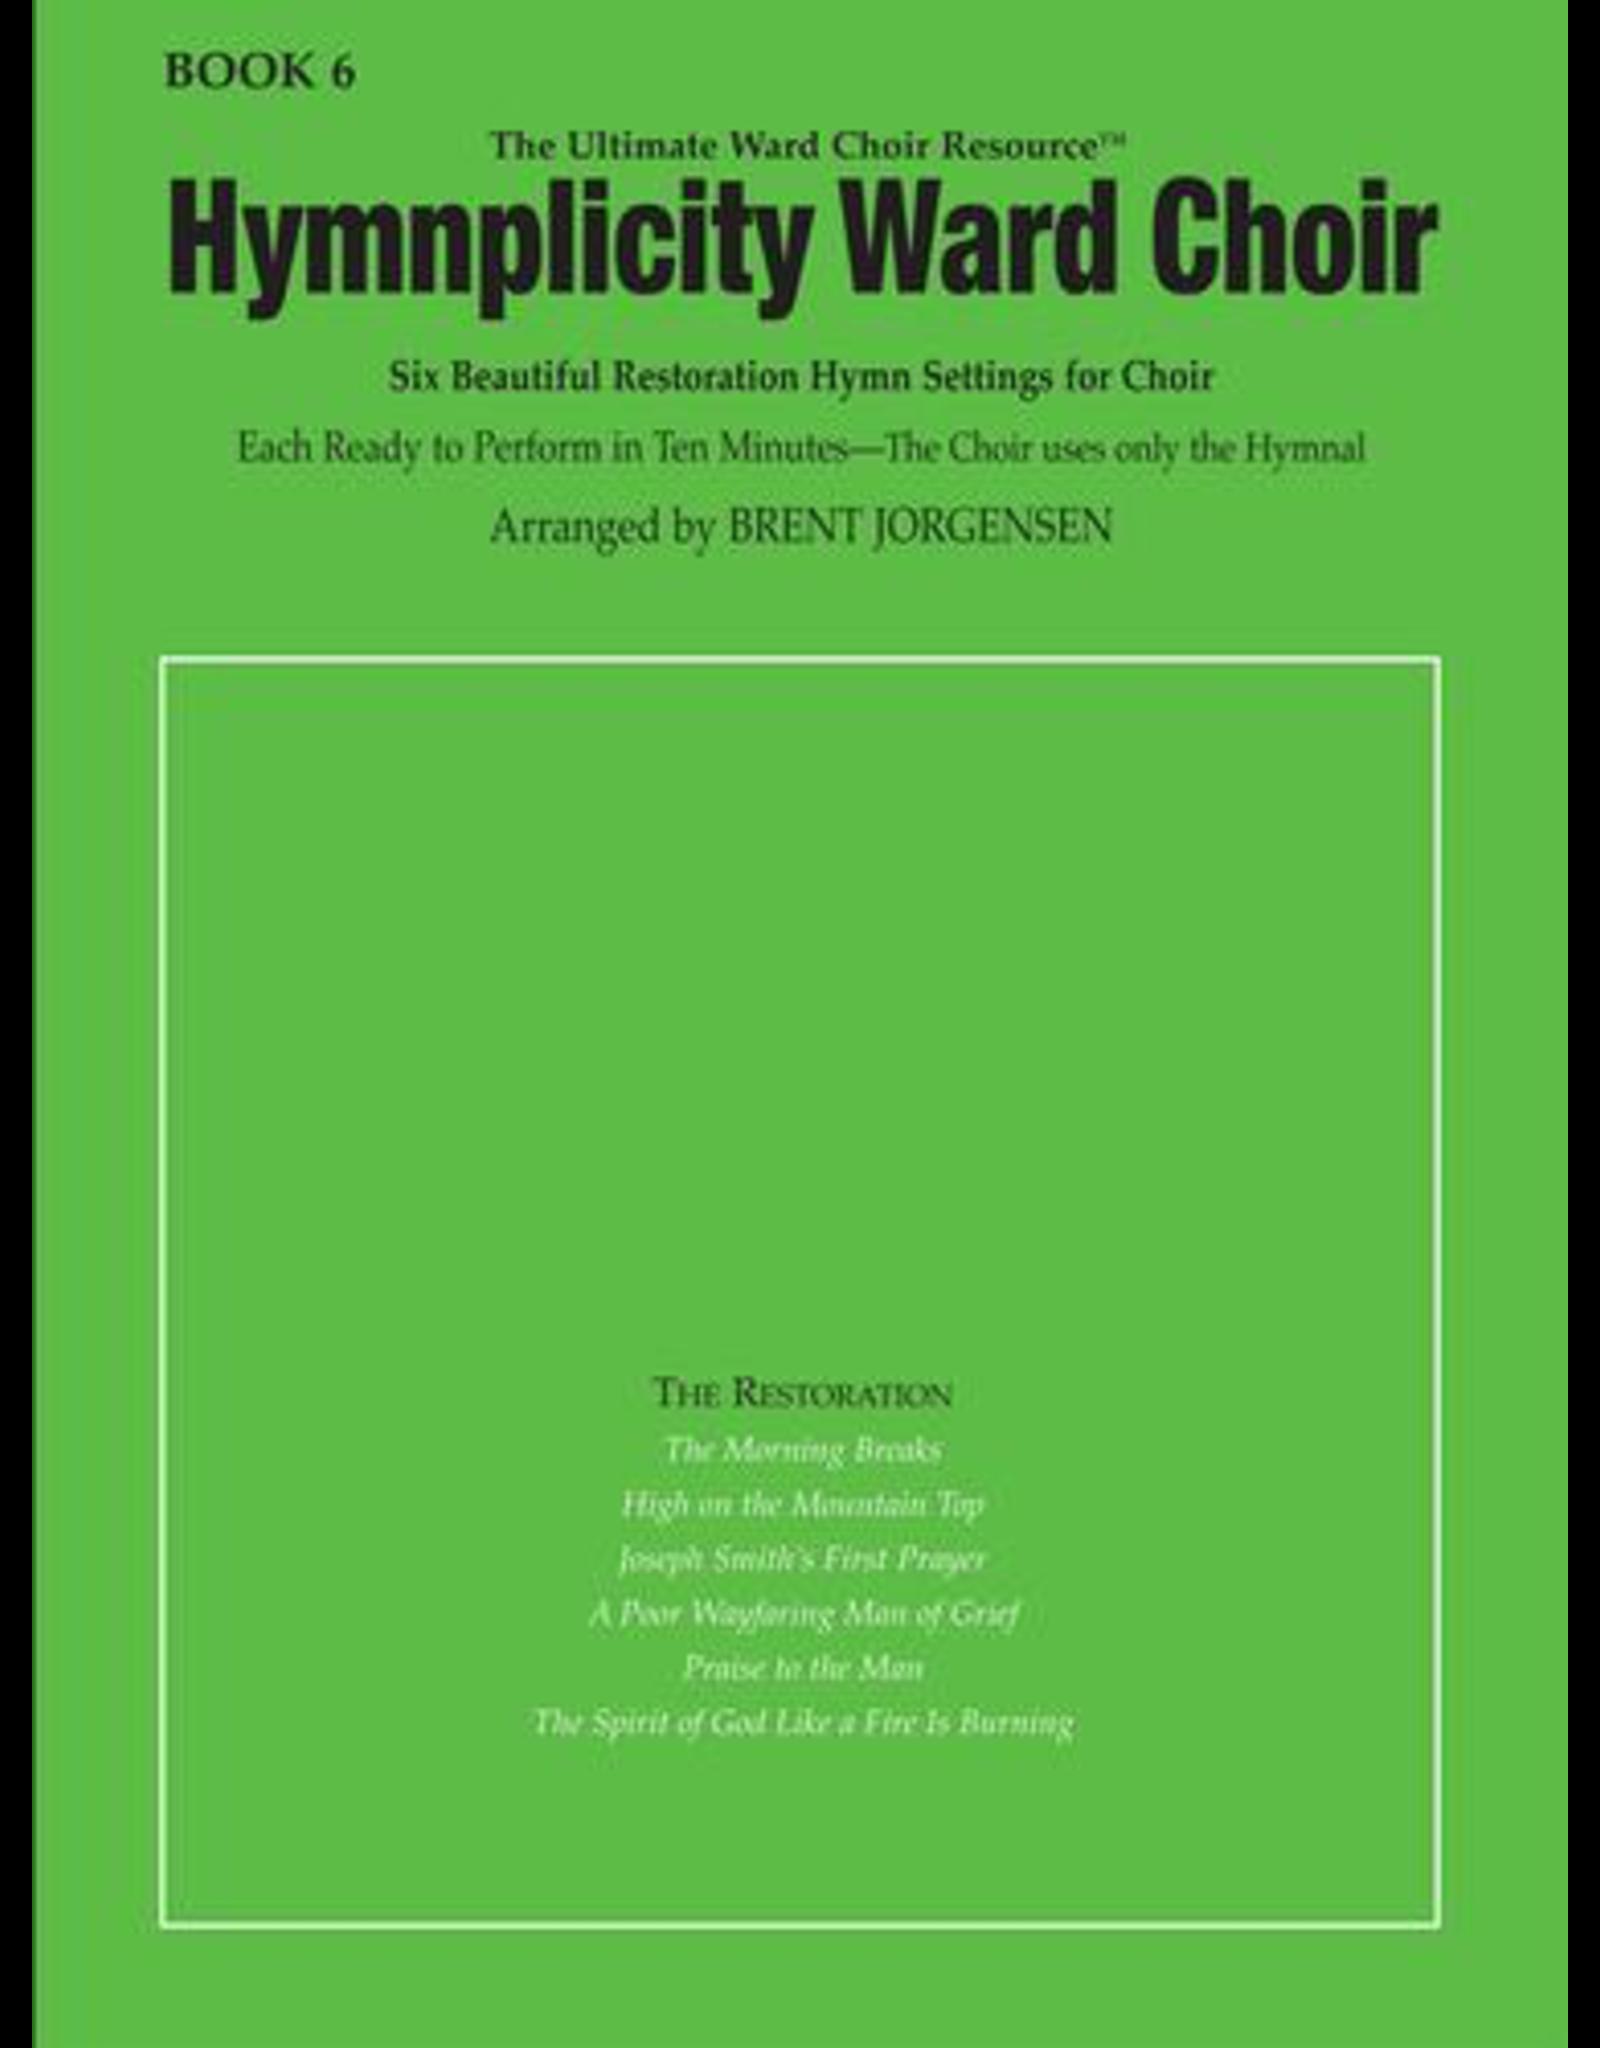 Jackman Music Hymnplicity Ward Choir, Book 6